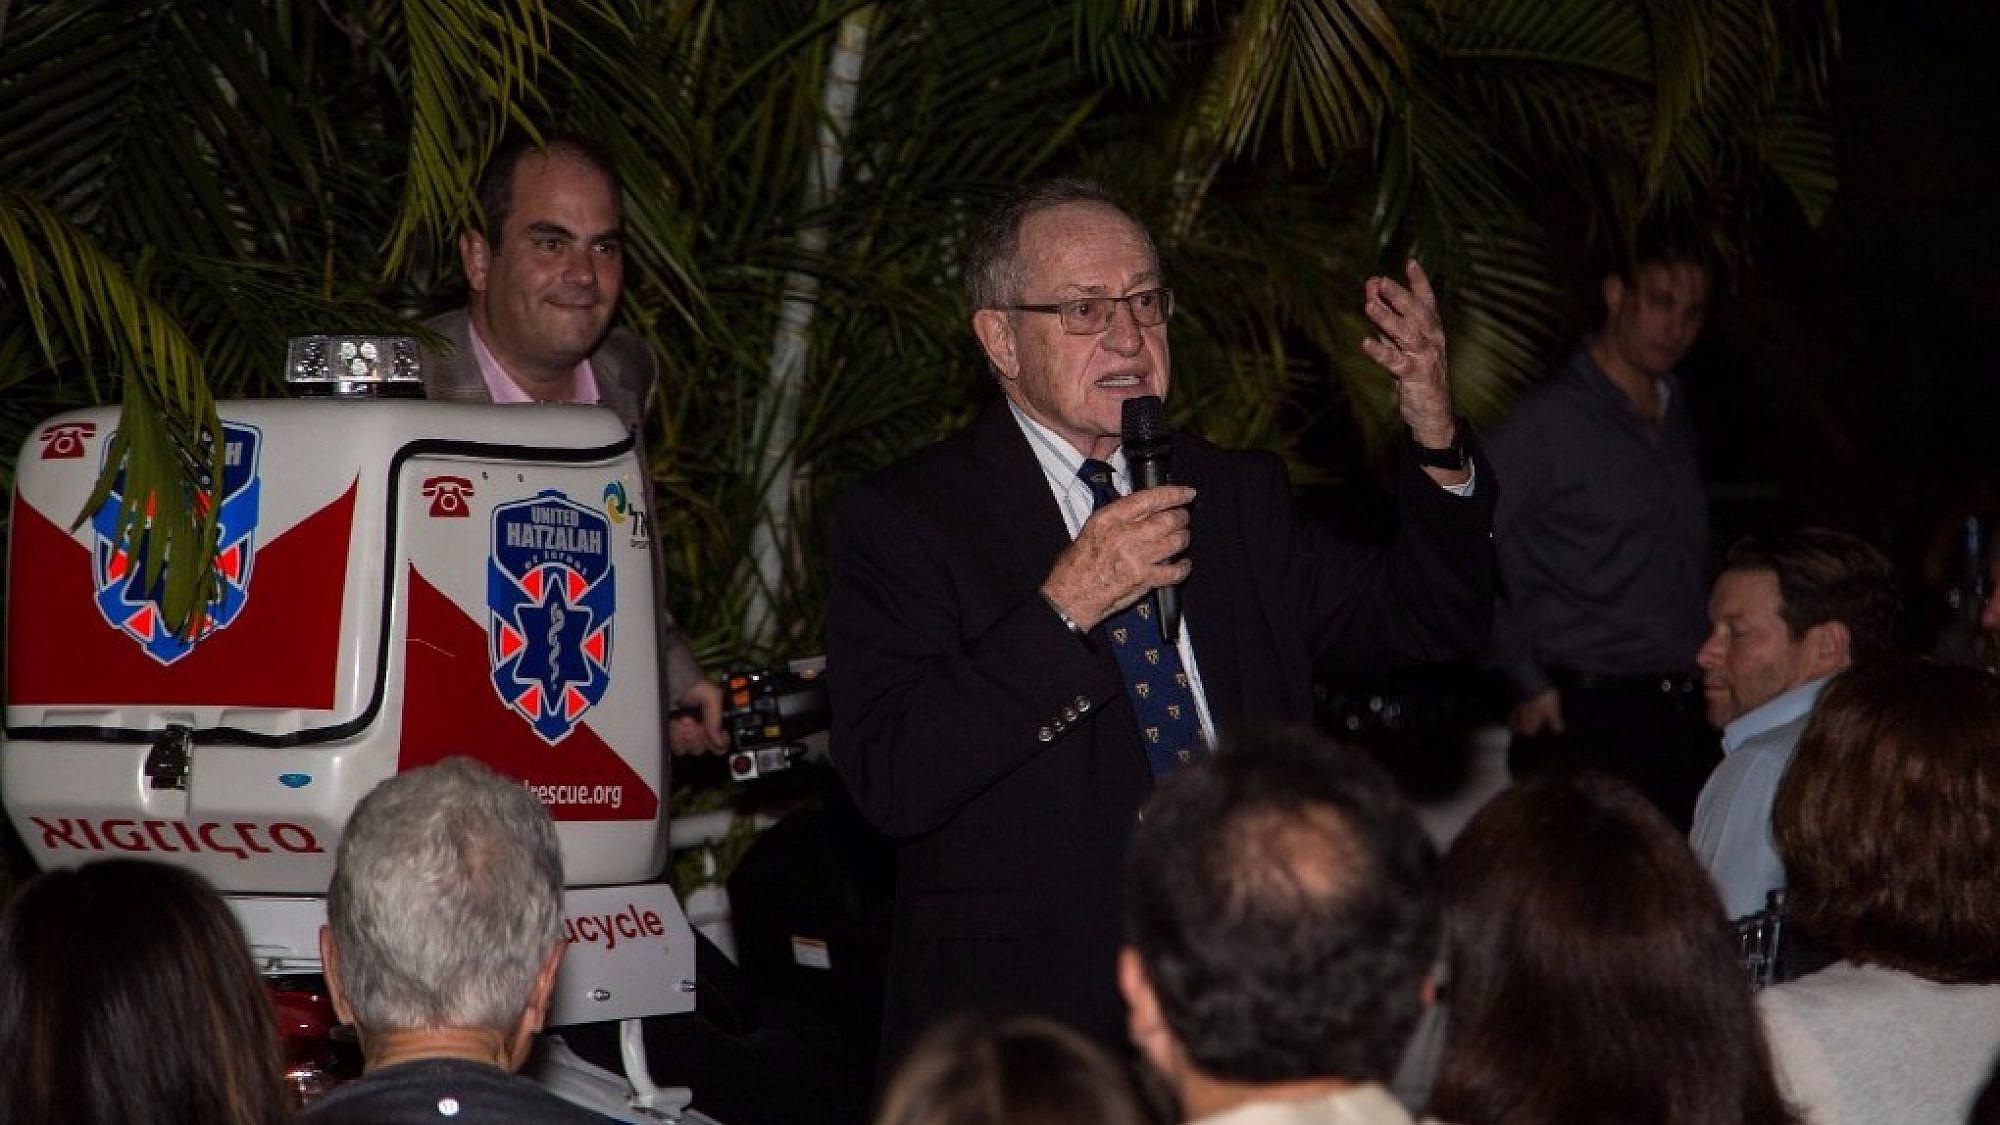 Alan Dershowitz speaking at a ceremony highlighting his donation of a ambucycle to Israel's volunteer medic organization, United Hatzalah. Credit: United Hatzalah.